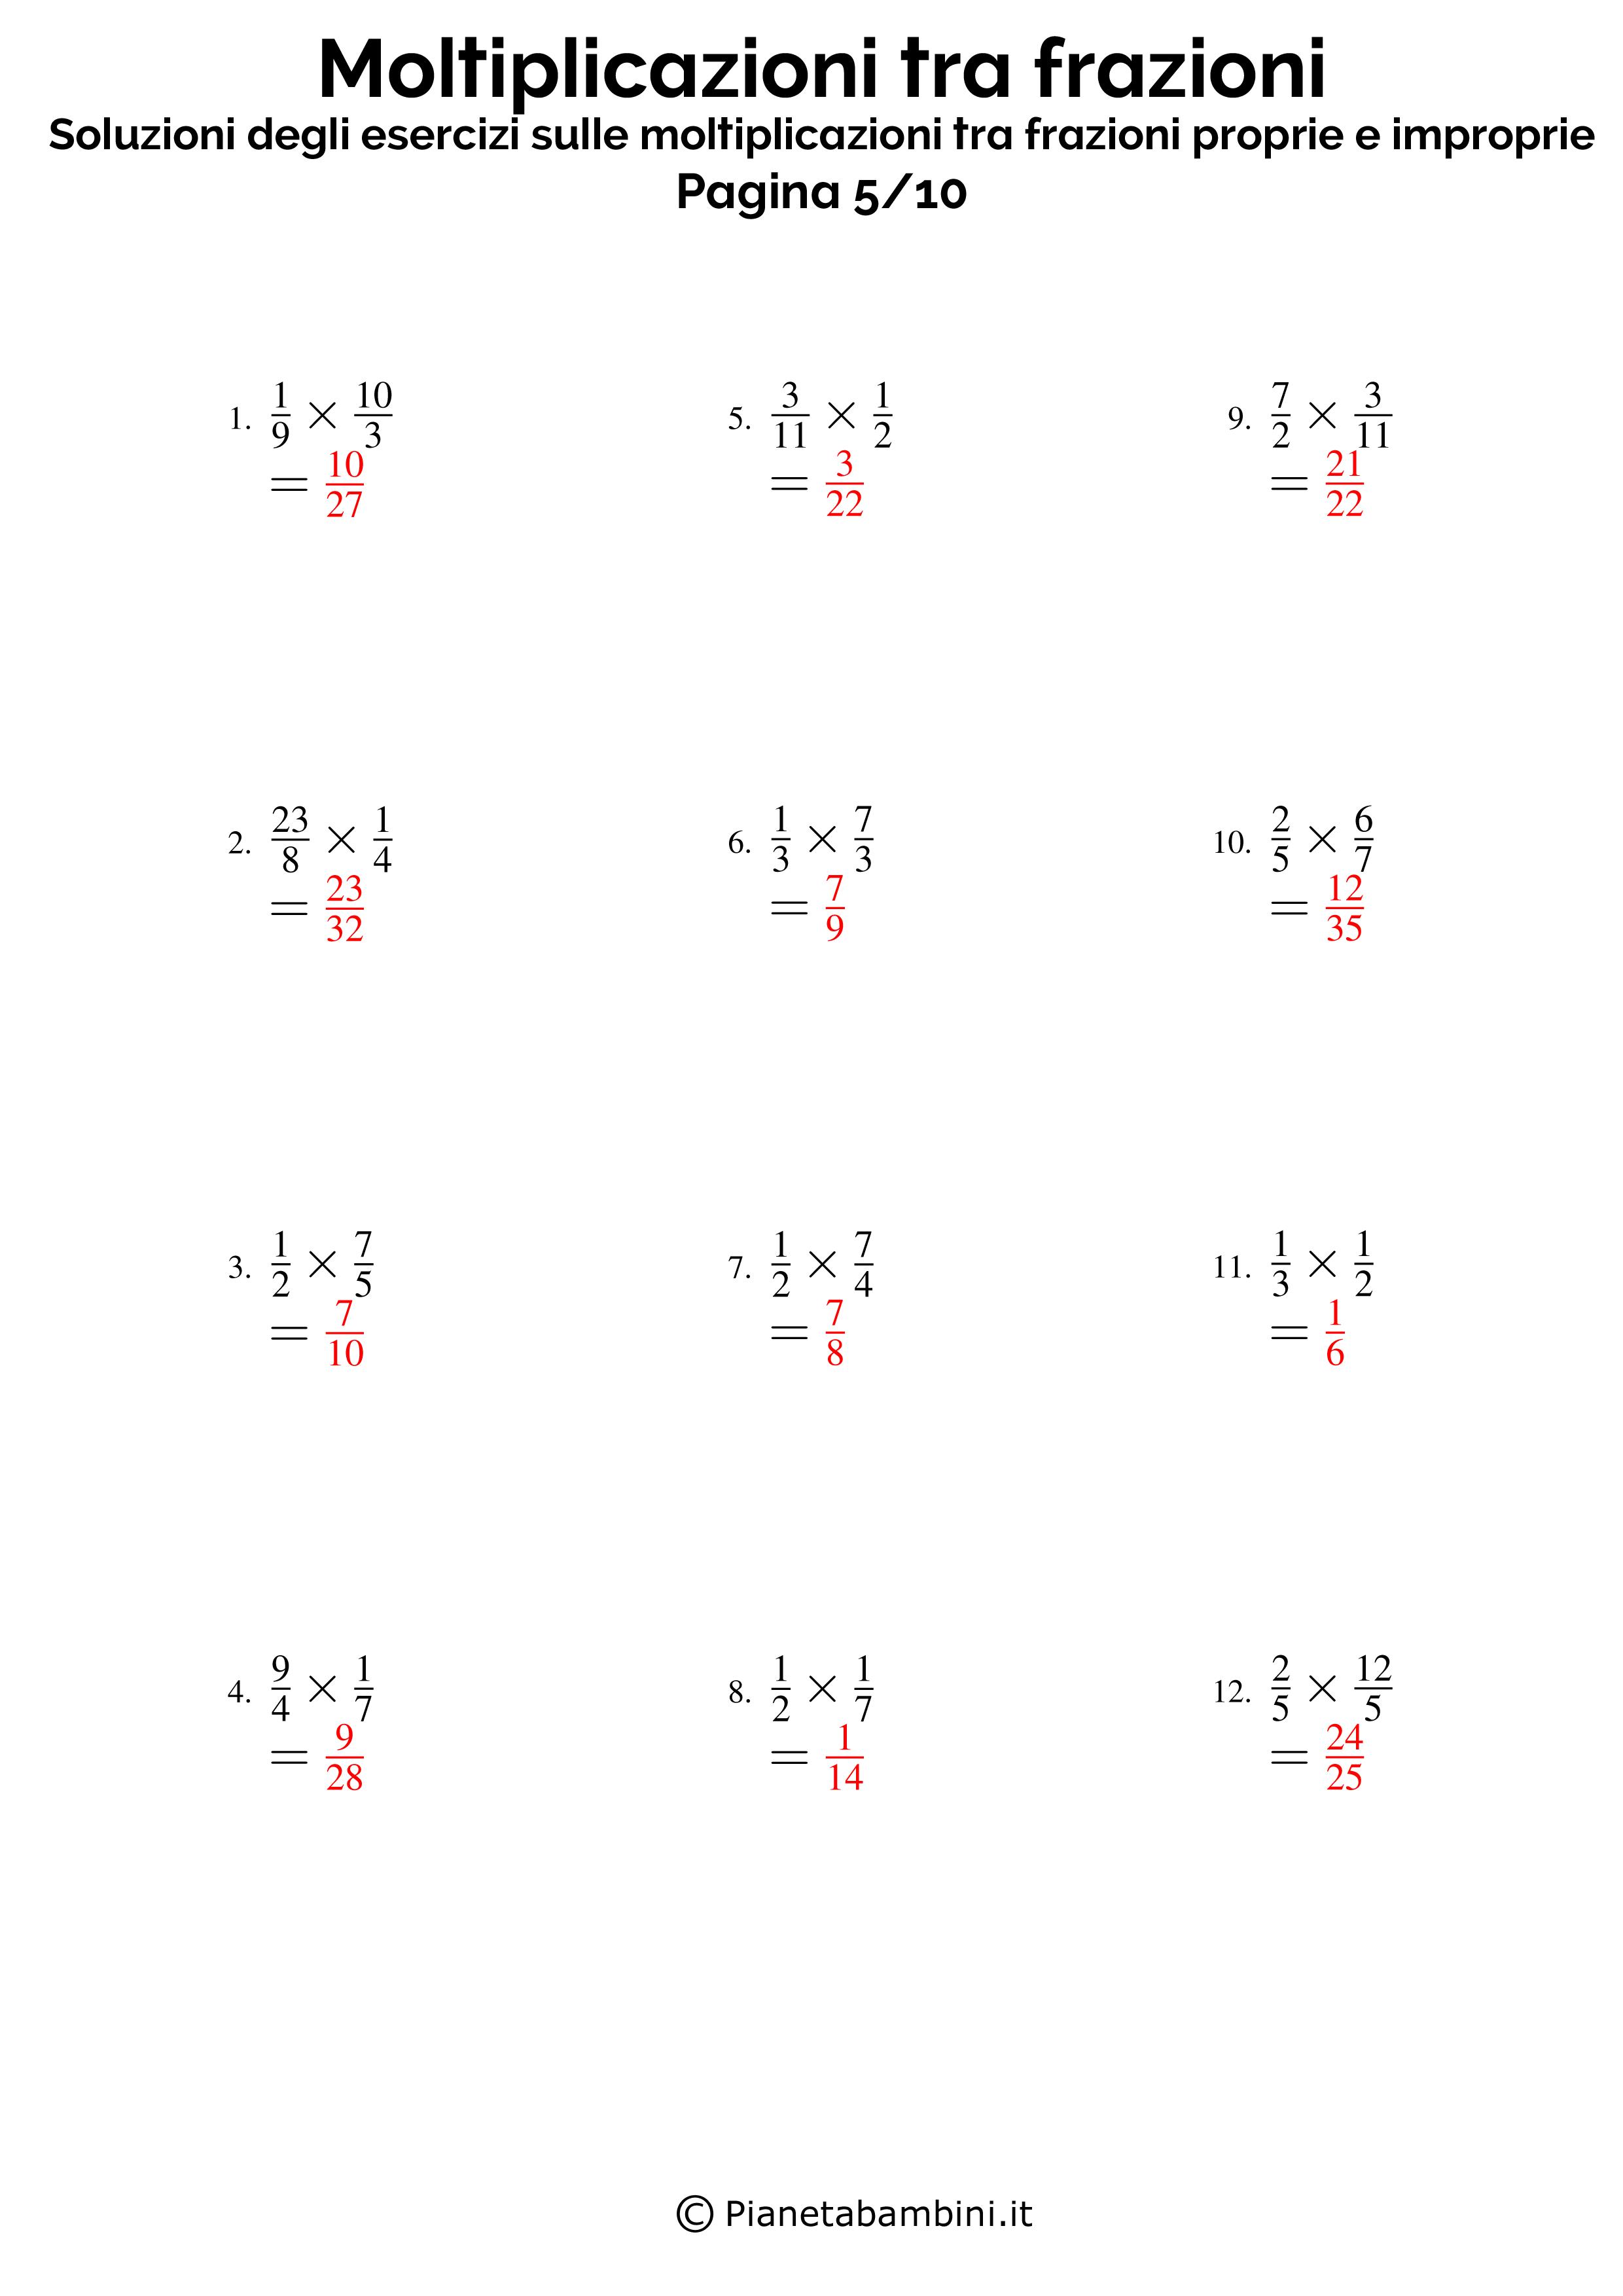 Soluzioni-Moltiplicazioni-Frazioni-Proprie-Improprie_05